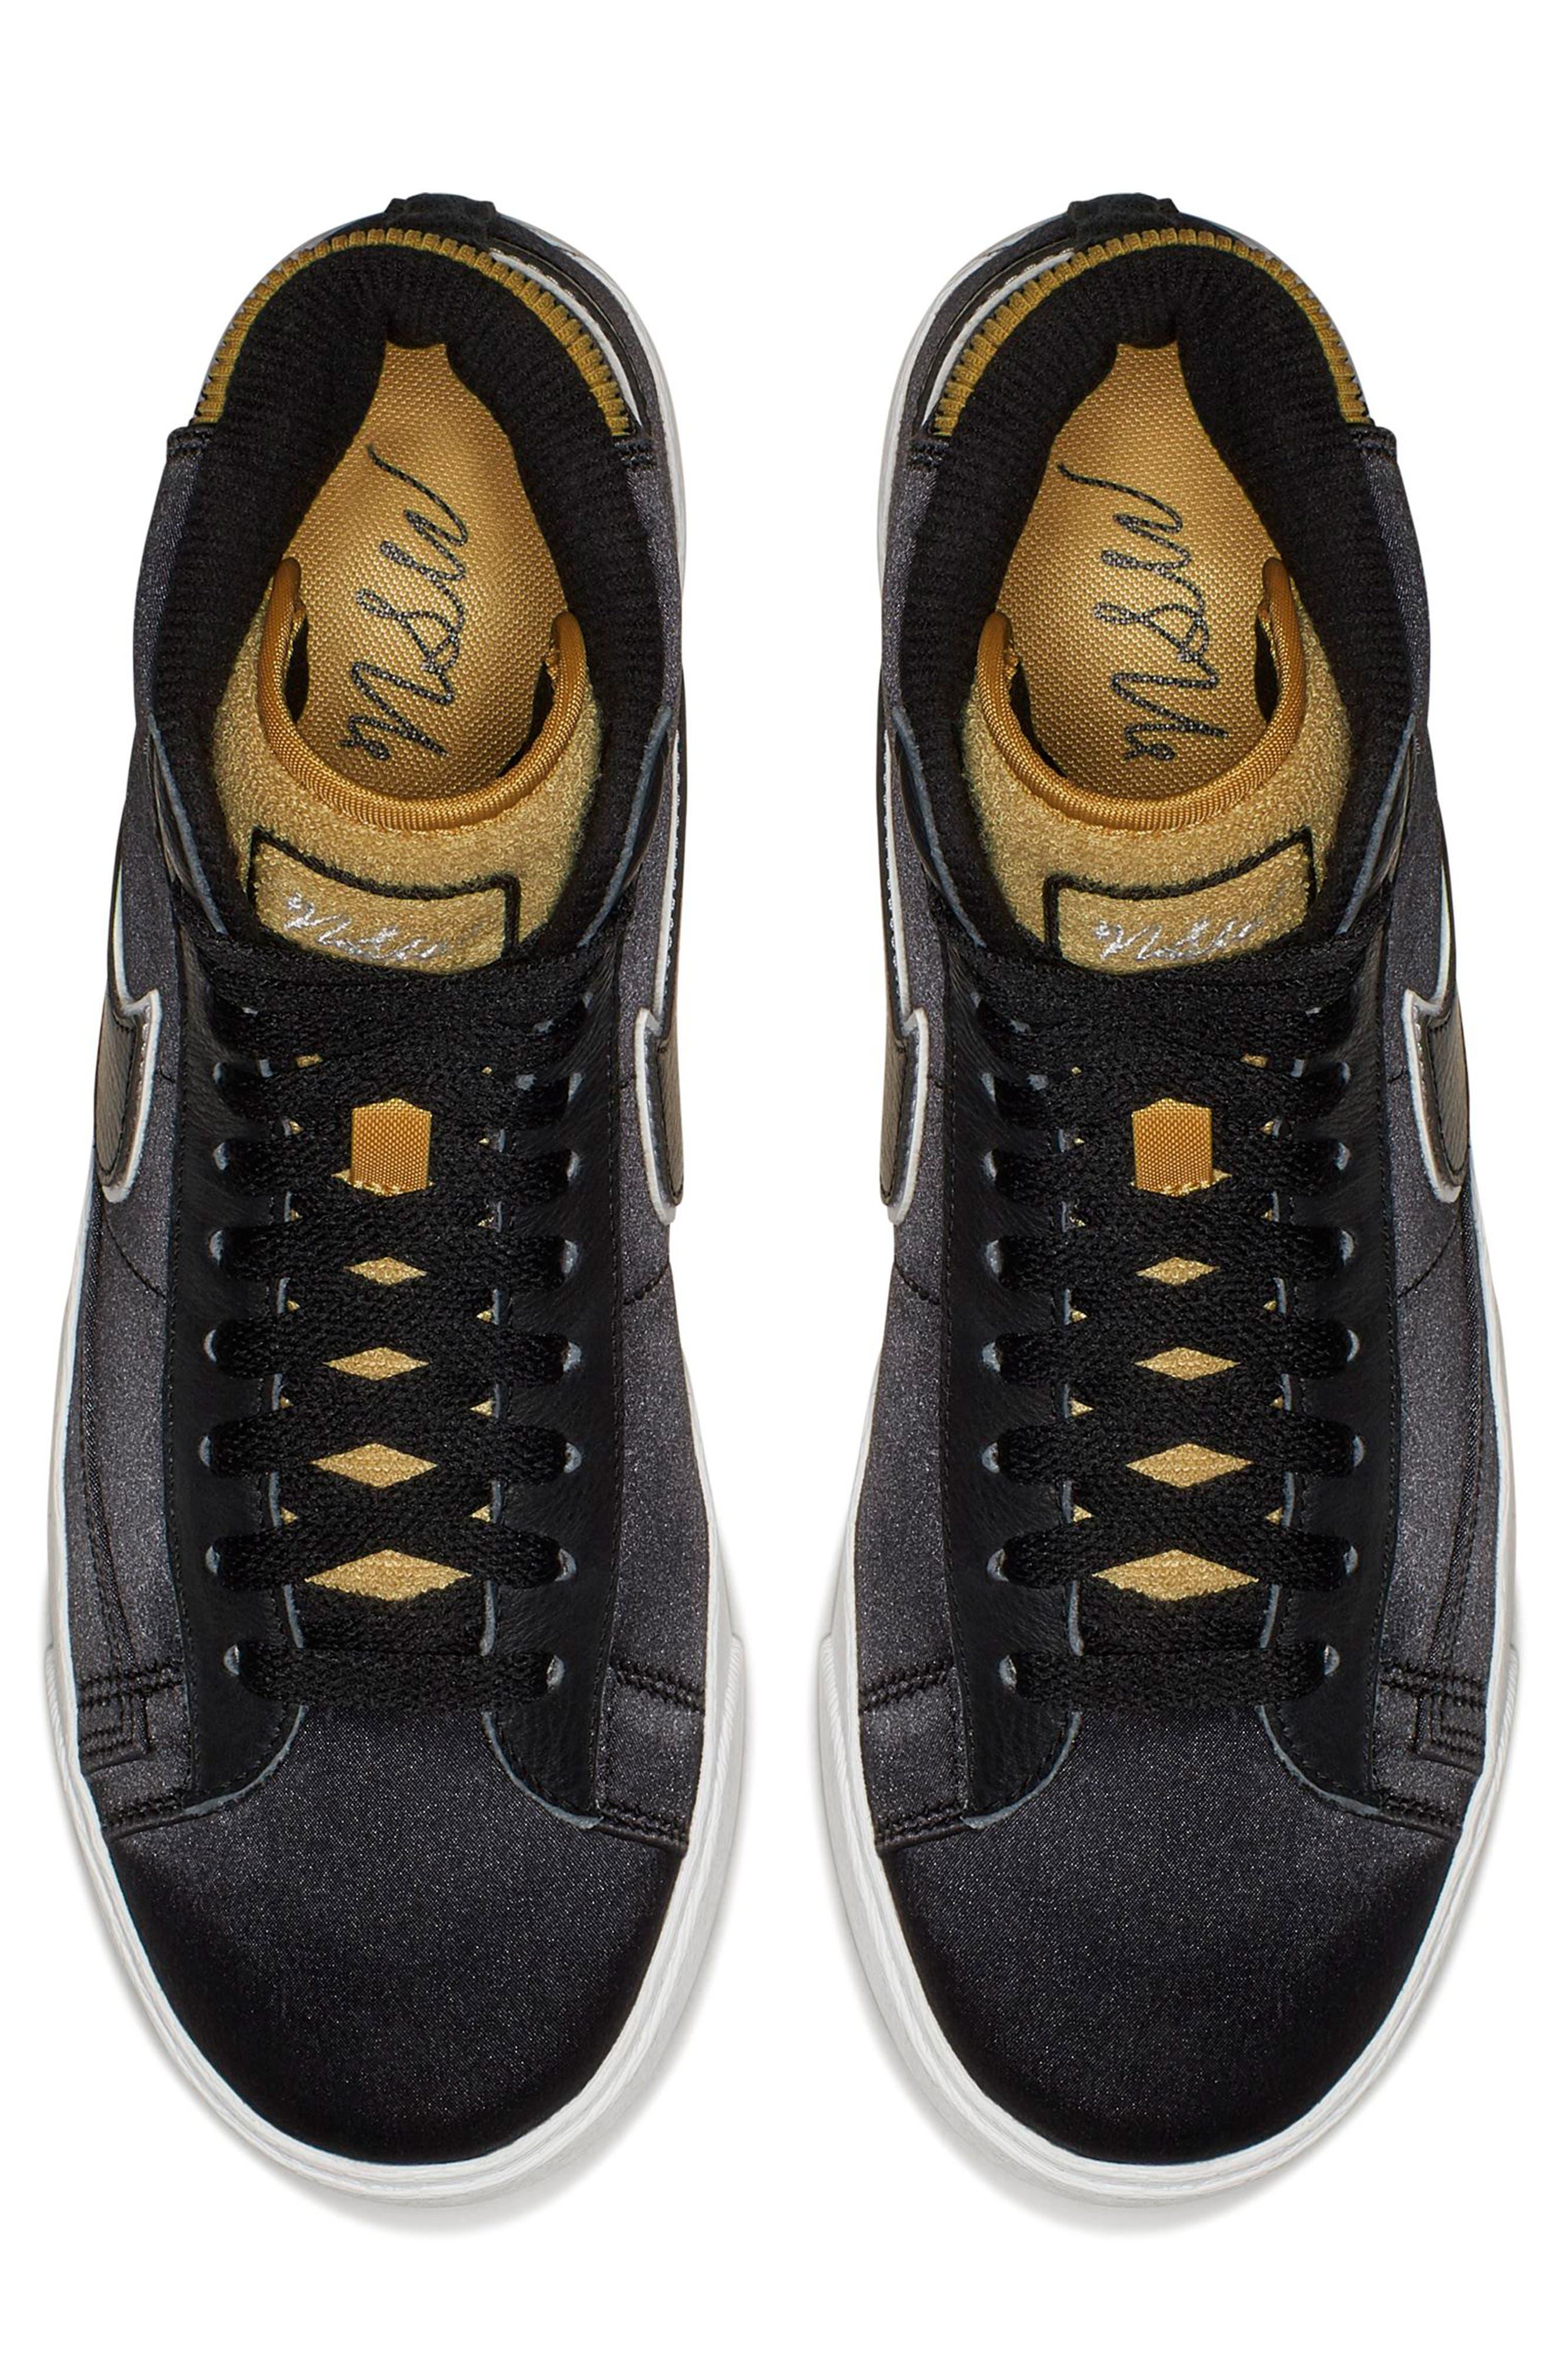 Blazer Mid Top Sneaker,                             Alternate thumbnail 4, color,                             BLACK/ BLACK